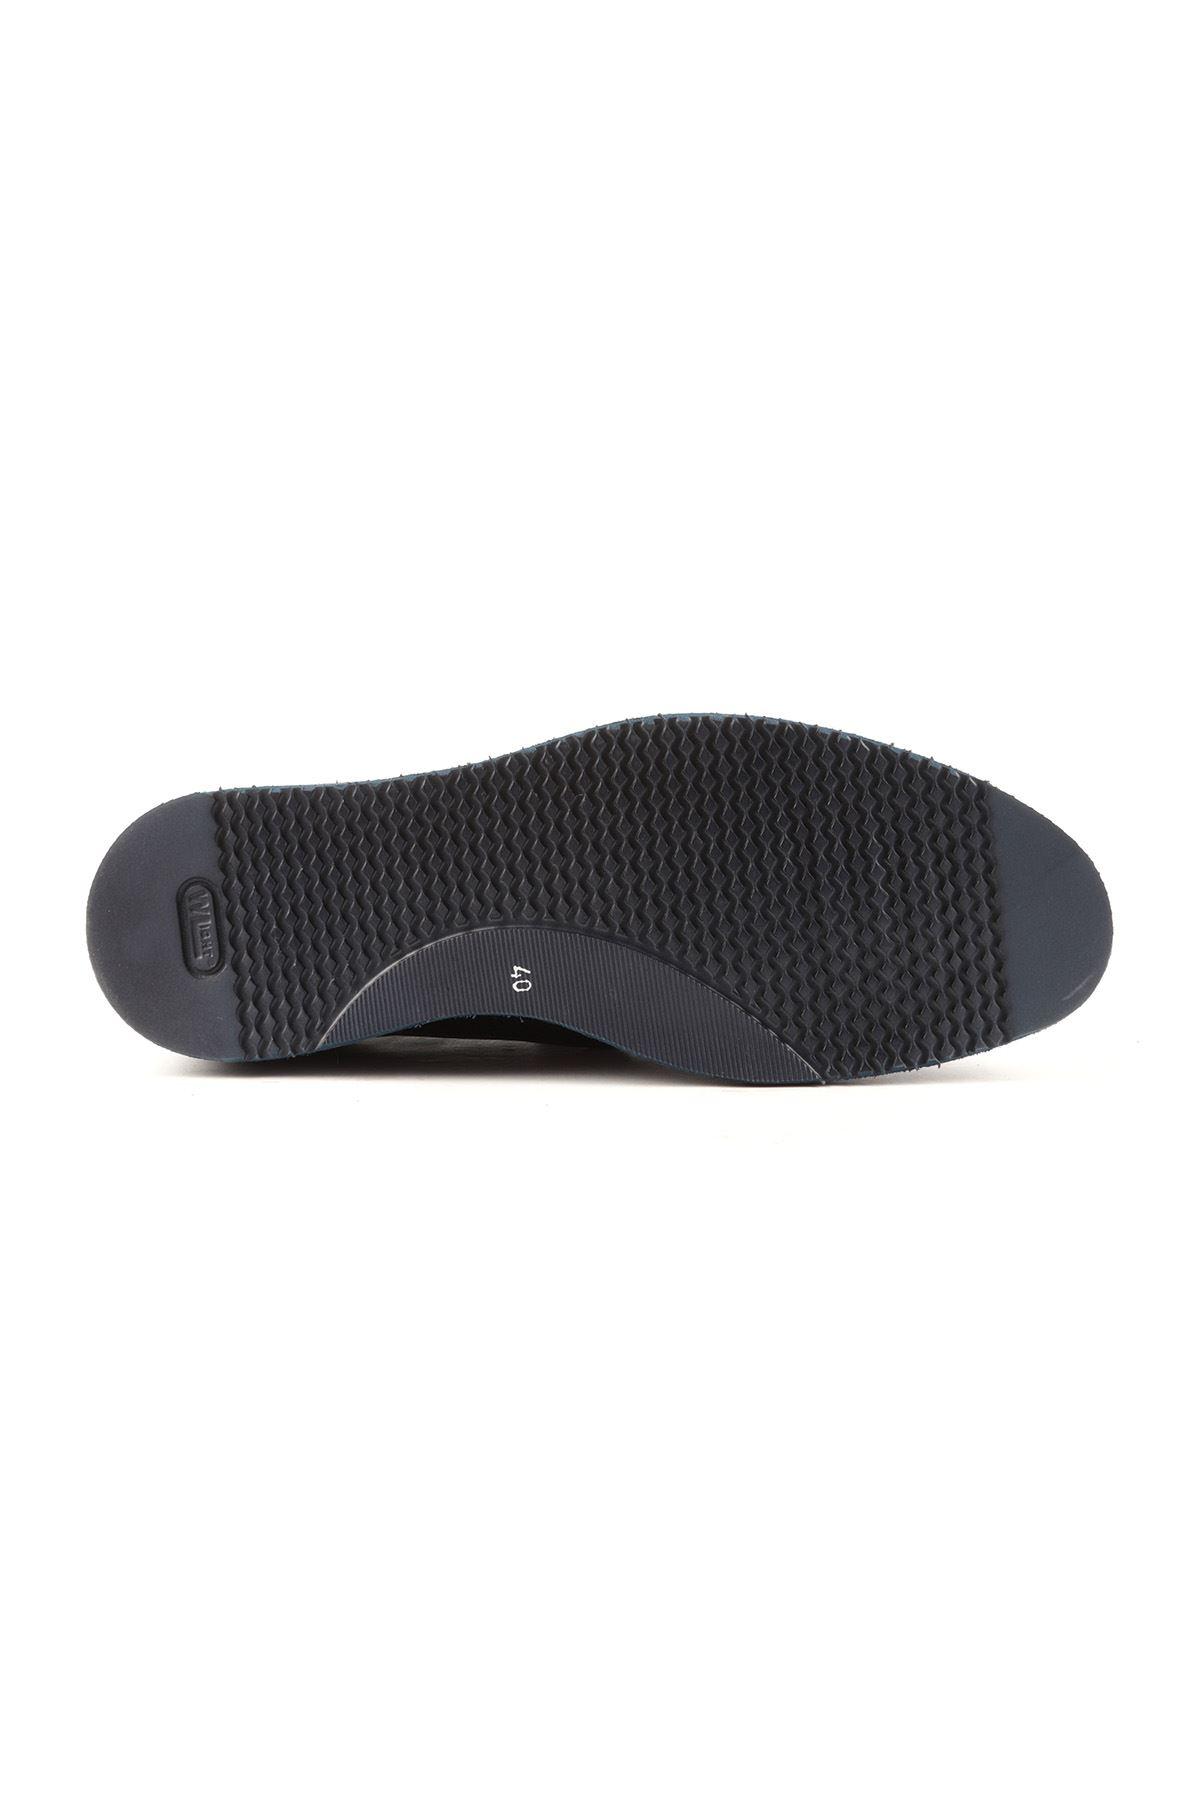 Libero L3456 EA Lacivert Erkek Ayakkabı